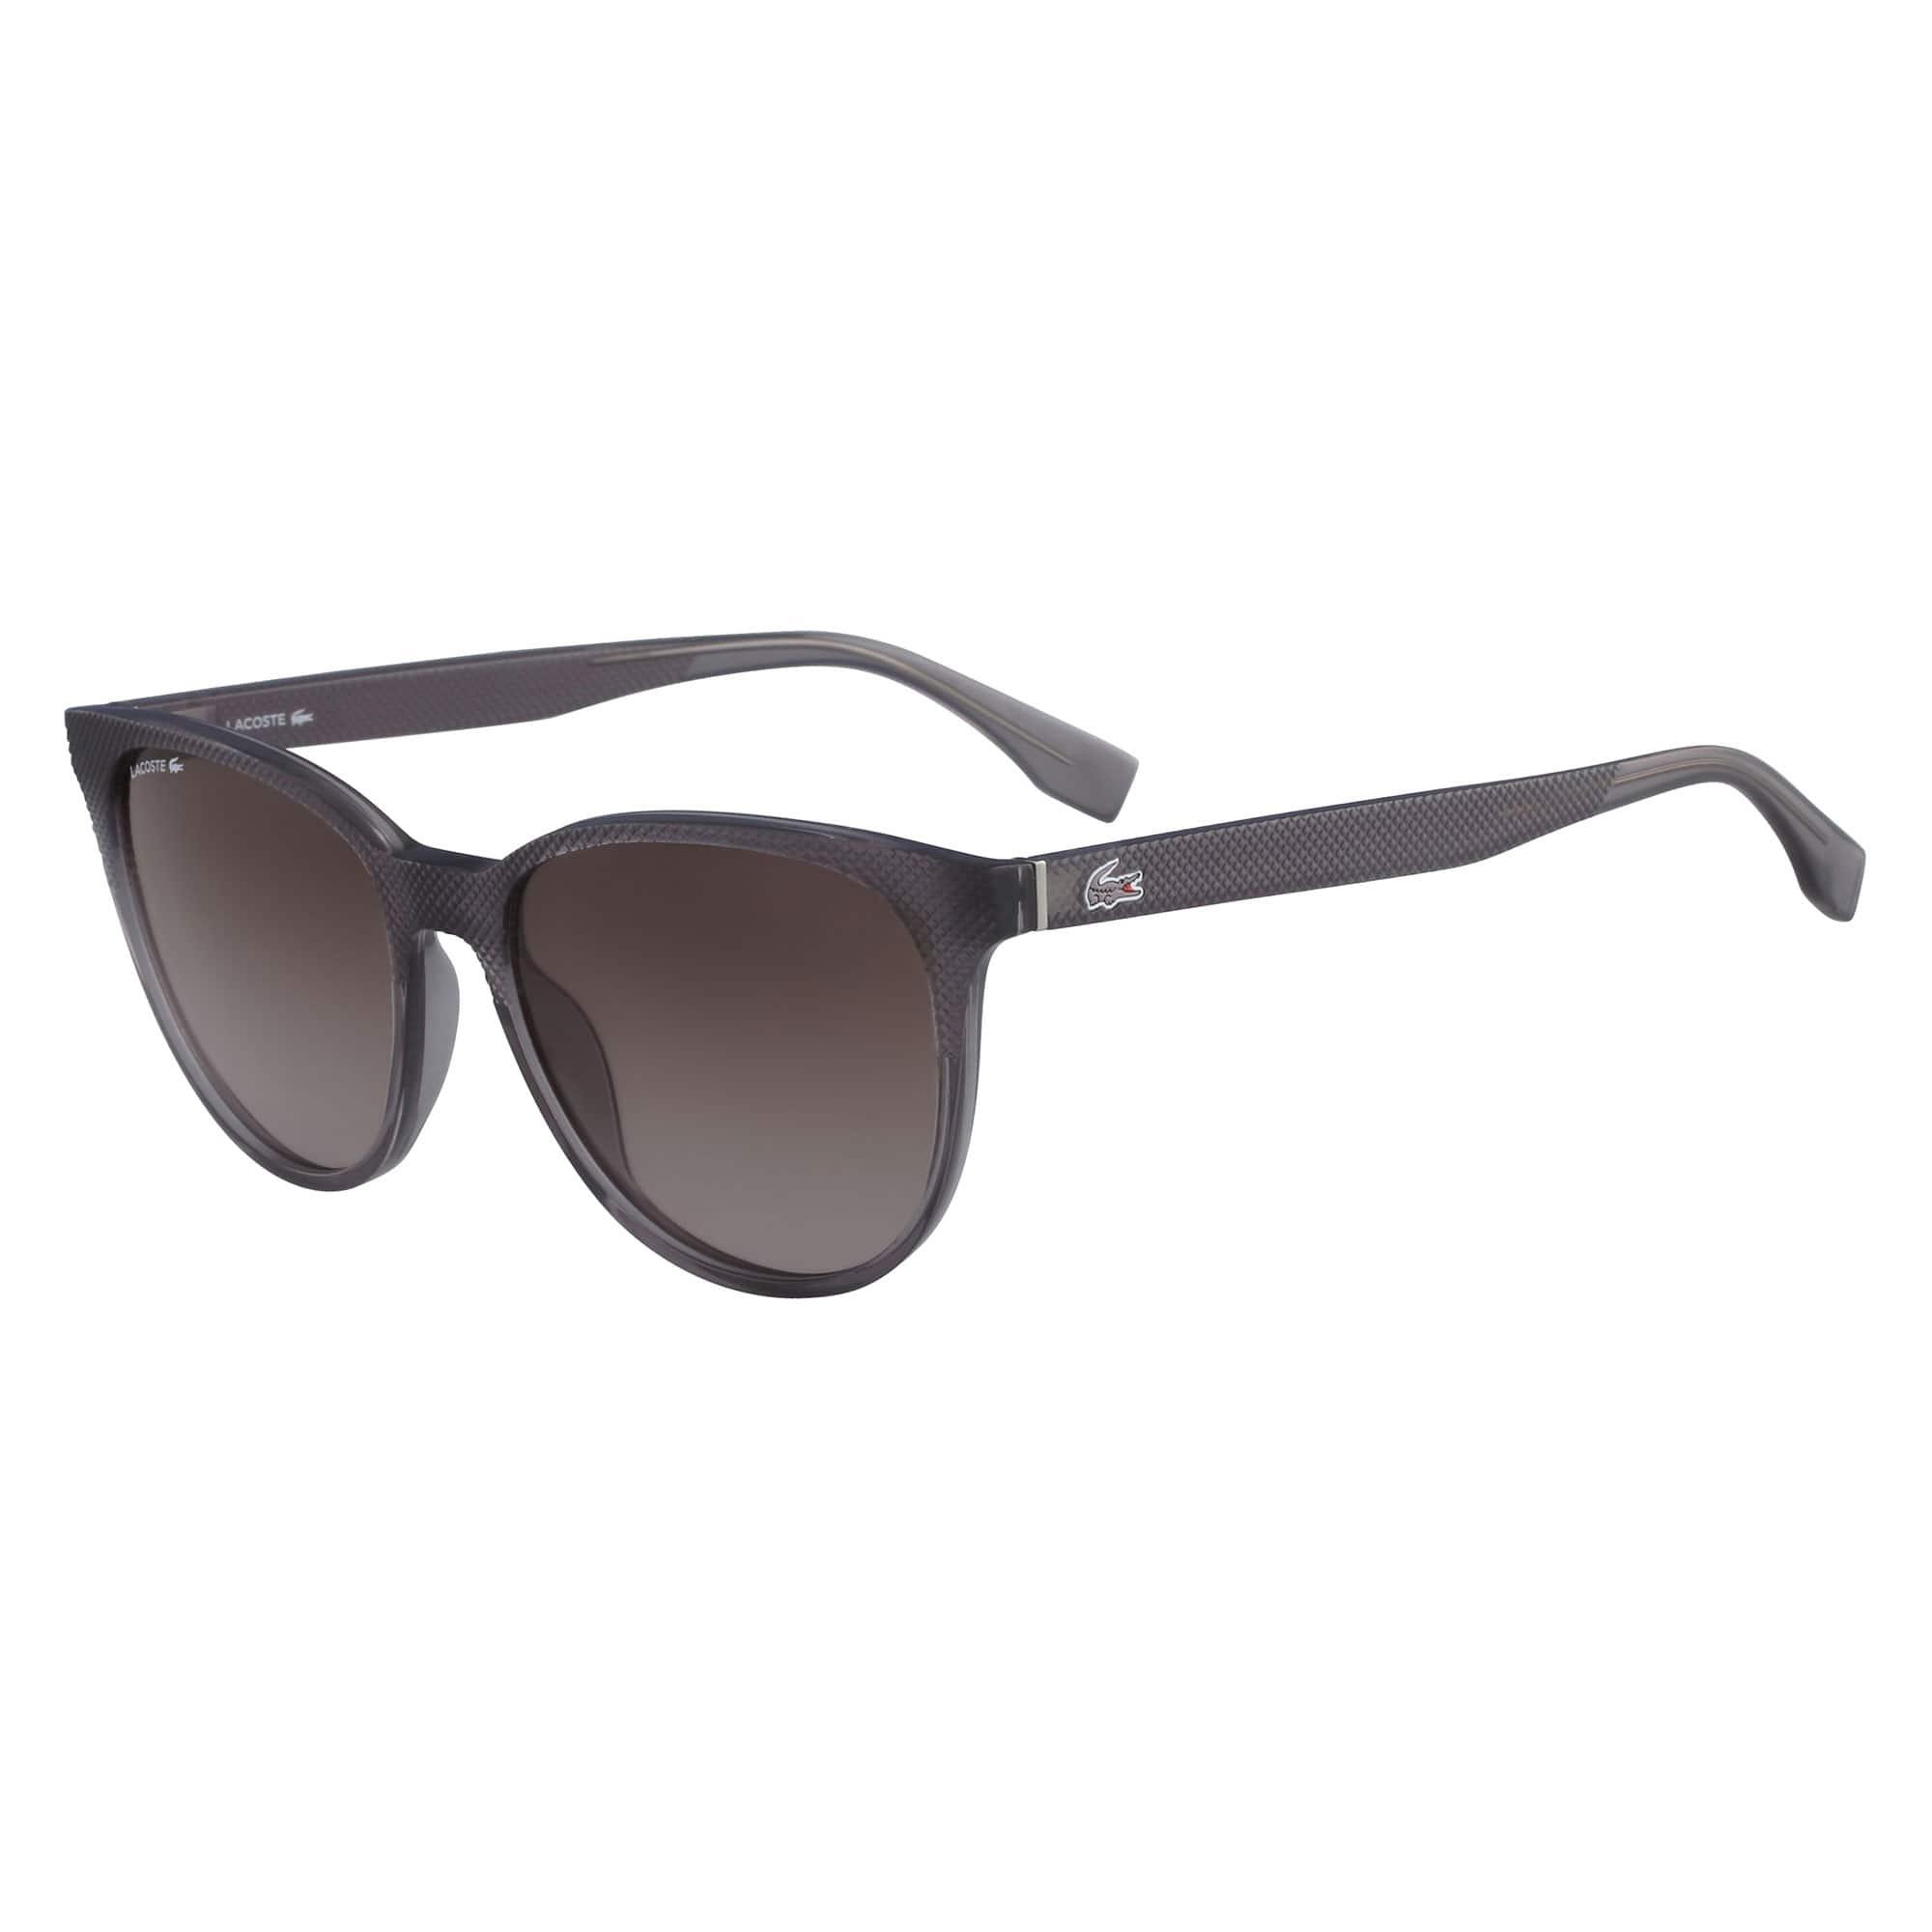 12 Plastic Cateye Women's 12 Sunglasses L LMpjSzqUGV